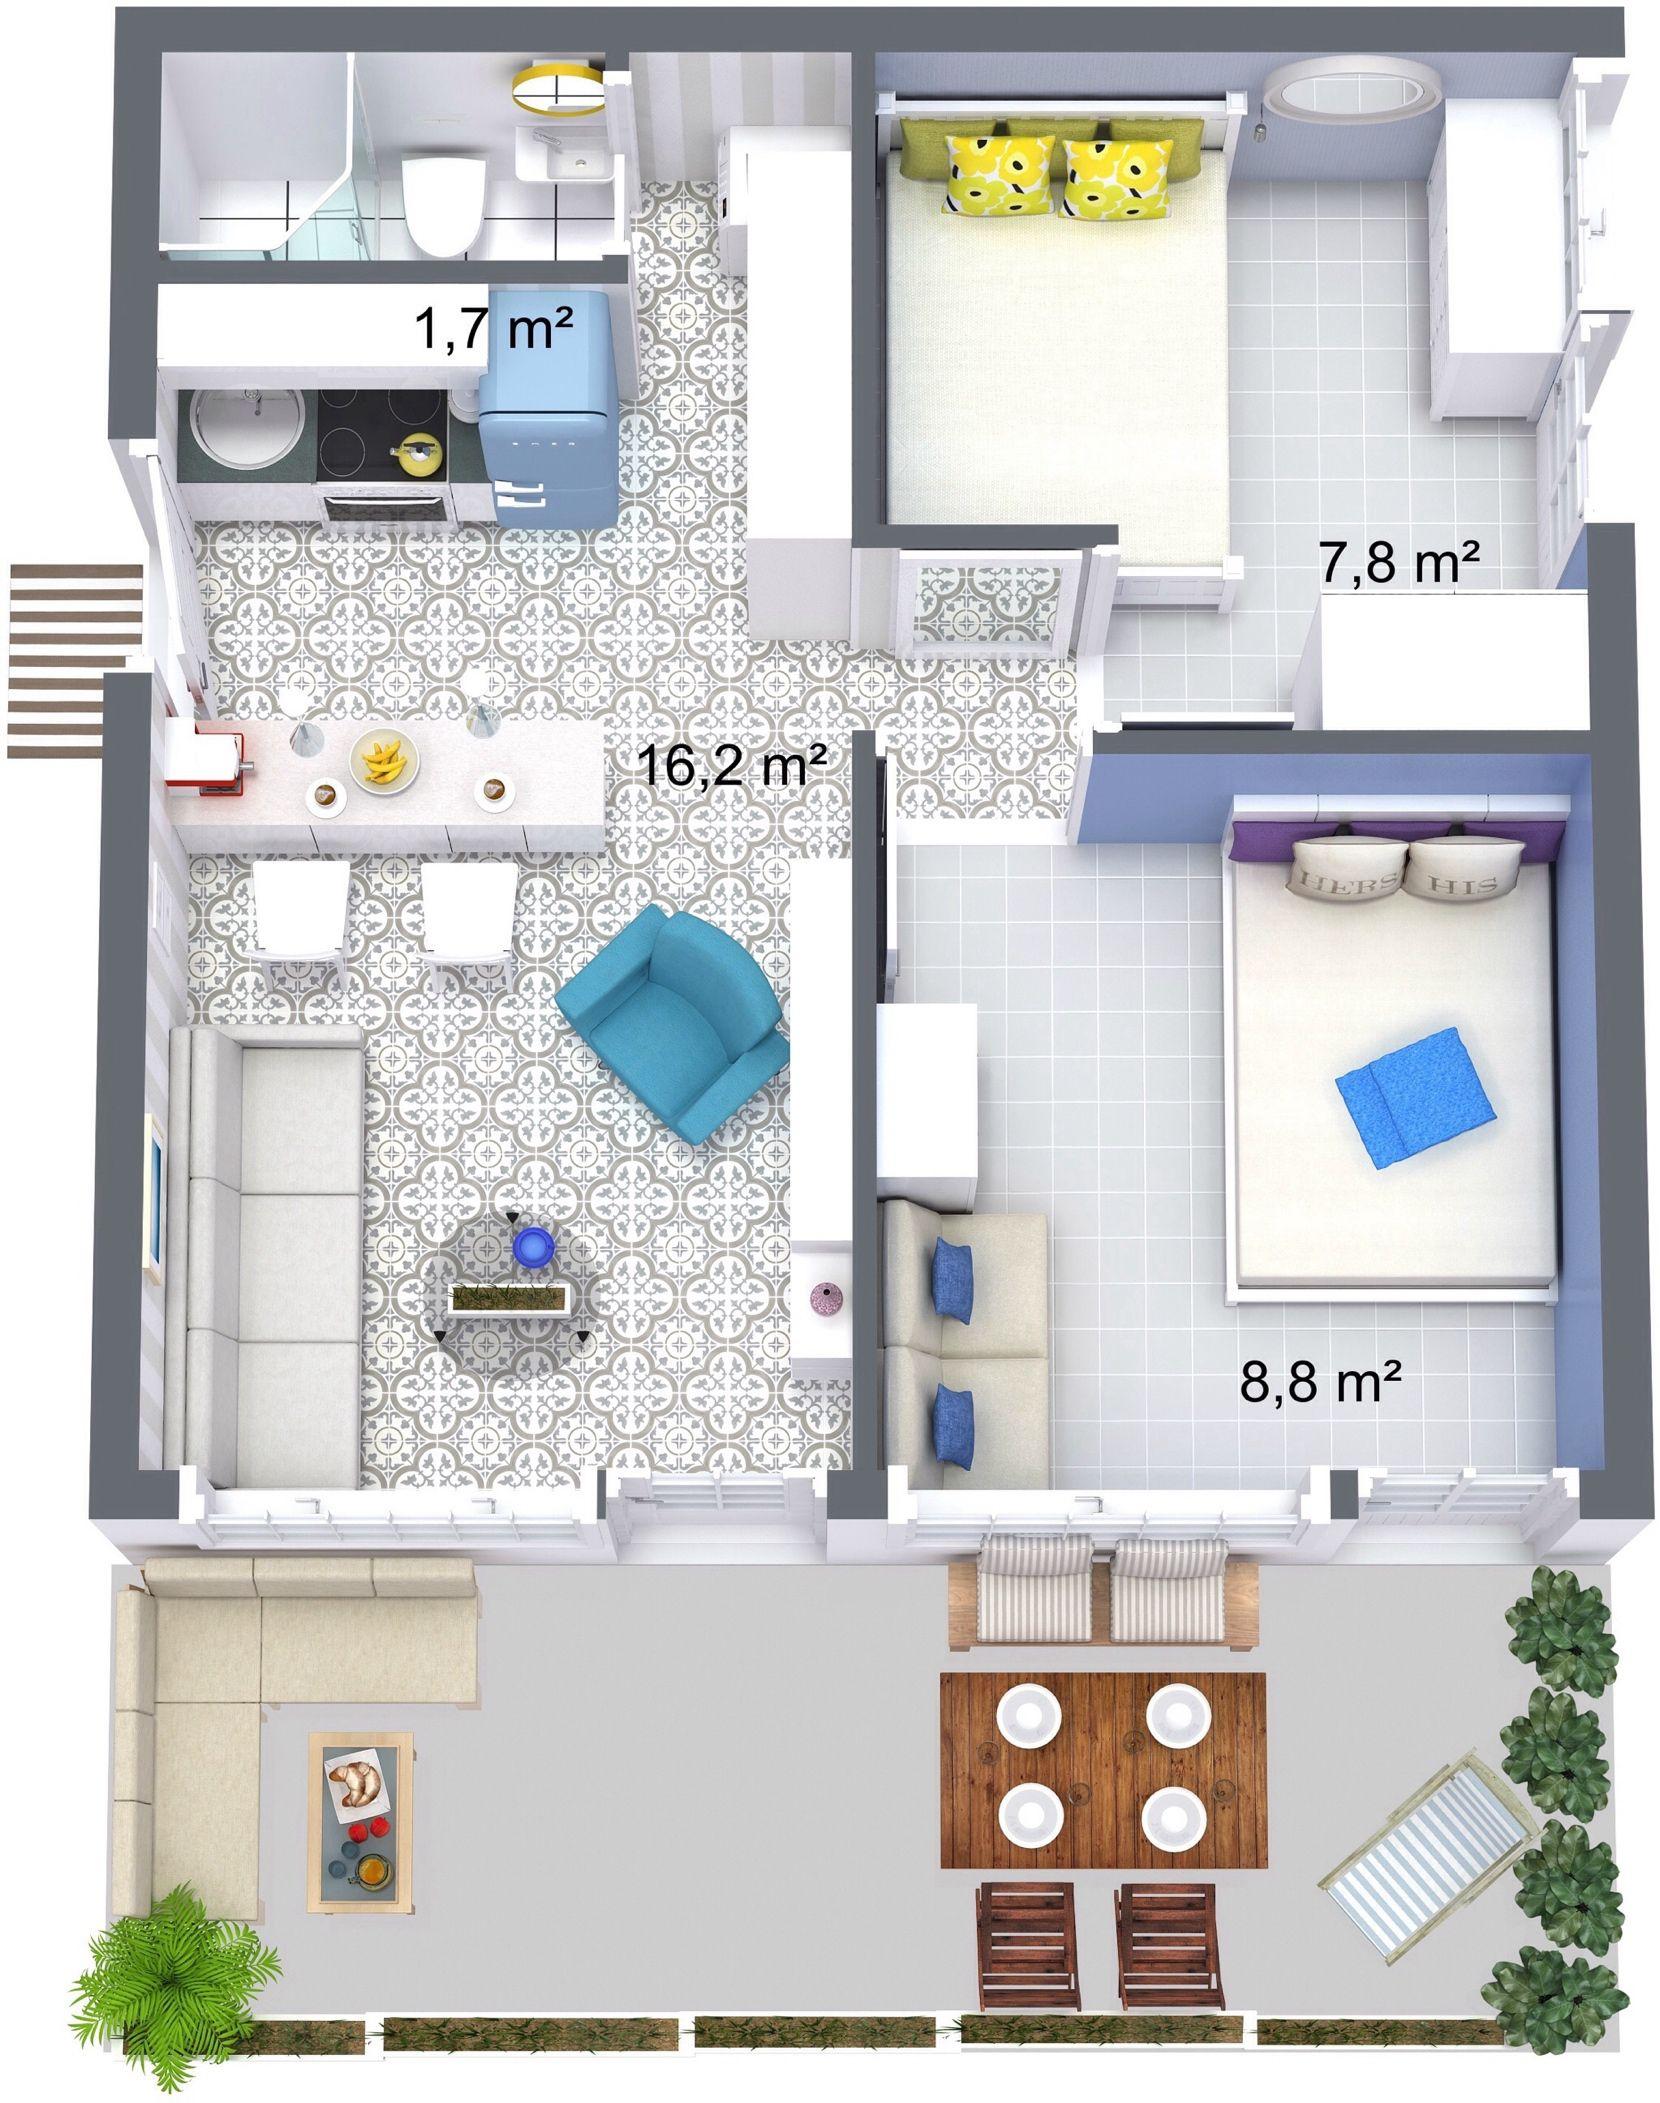 {.k.} blog - Decor Interiors and more! {Κωνσταντίνα Νάστου}  3D, floorplans, interiordesign, interiors, RoomSketcher, σπίτι, e-design, decor, decoration, home decor, beach house, διακόσμηση, διαμόρφωση μικρού διαμερίσματος, τρισδιάστατη κάτοψη, εξοχικό, παραθαλασσιο